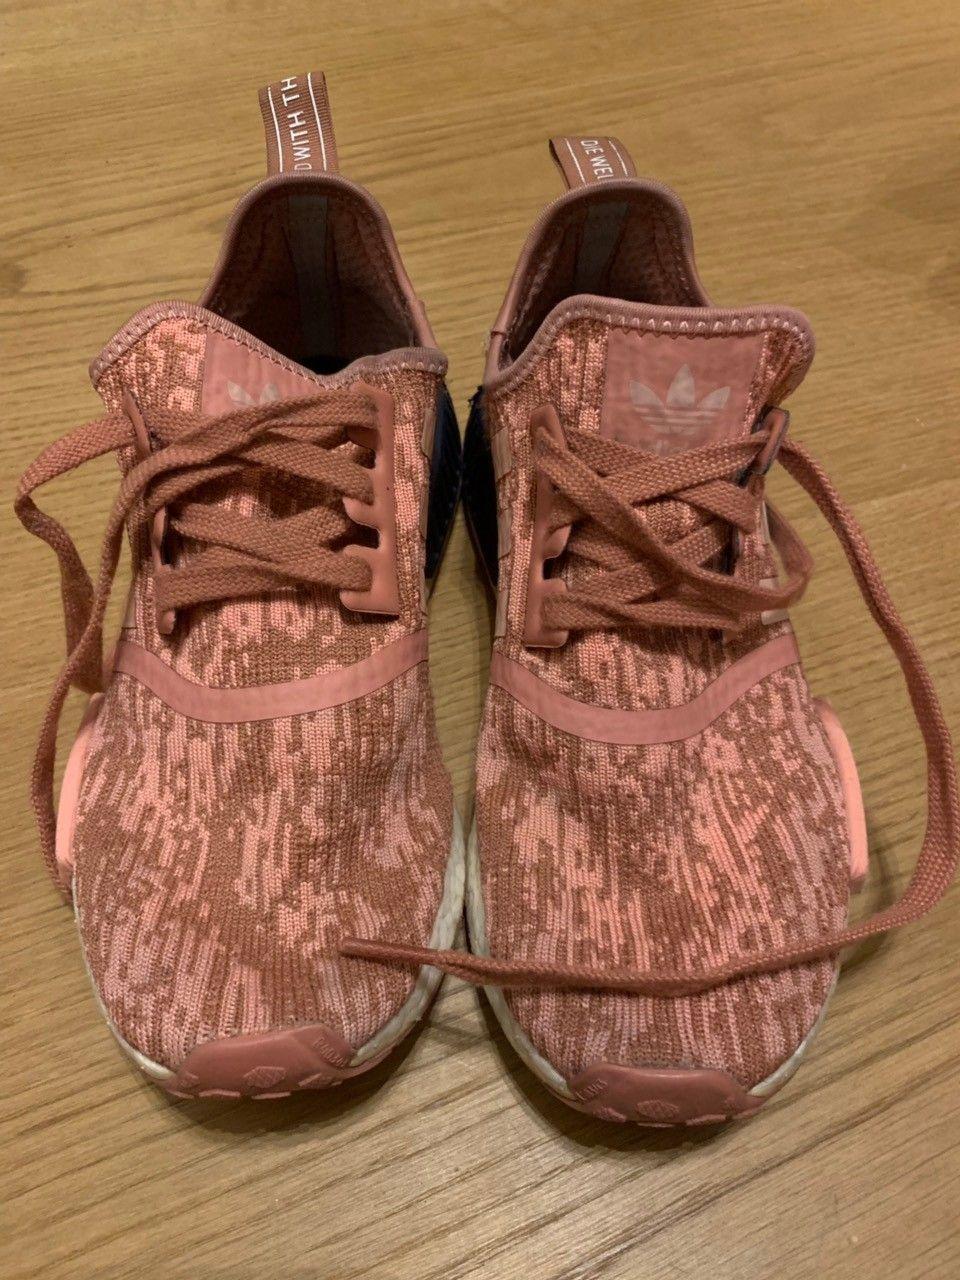 Adidas NMD rosa   FINN.no